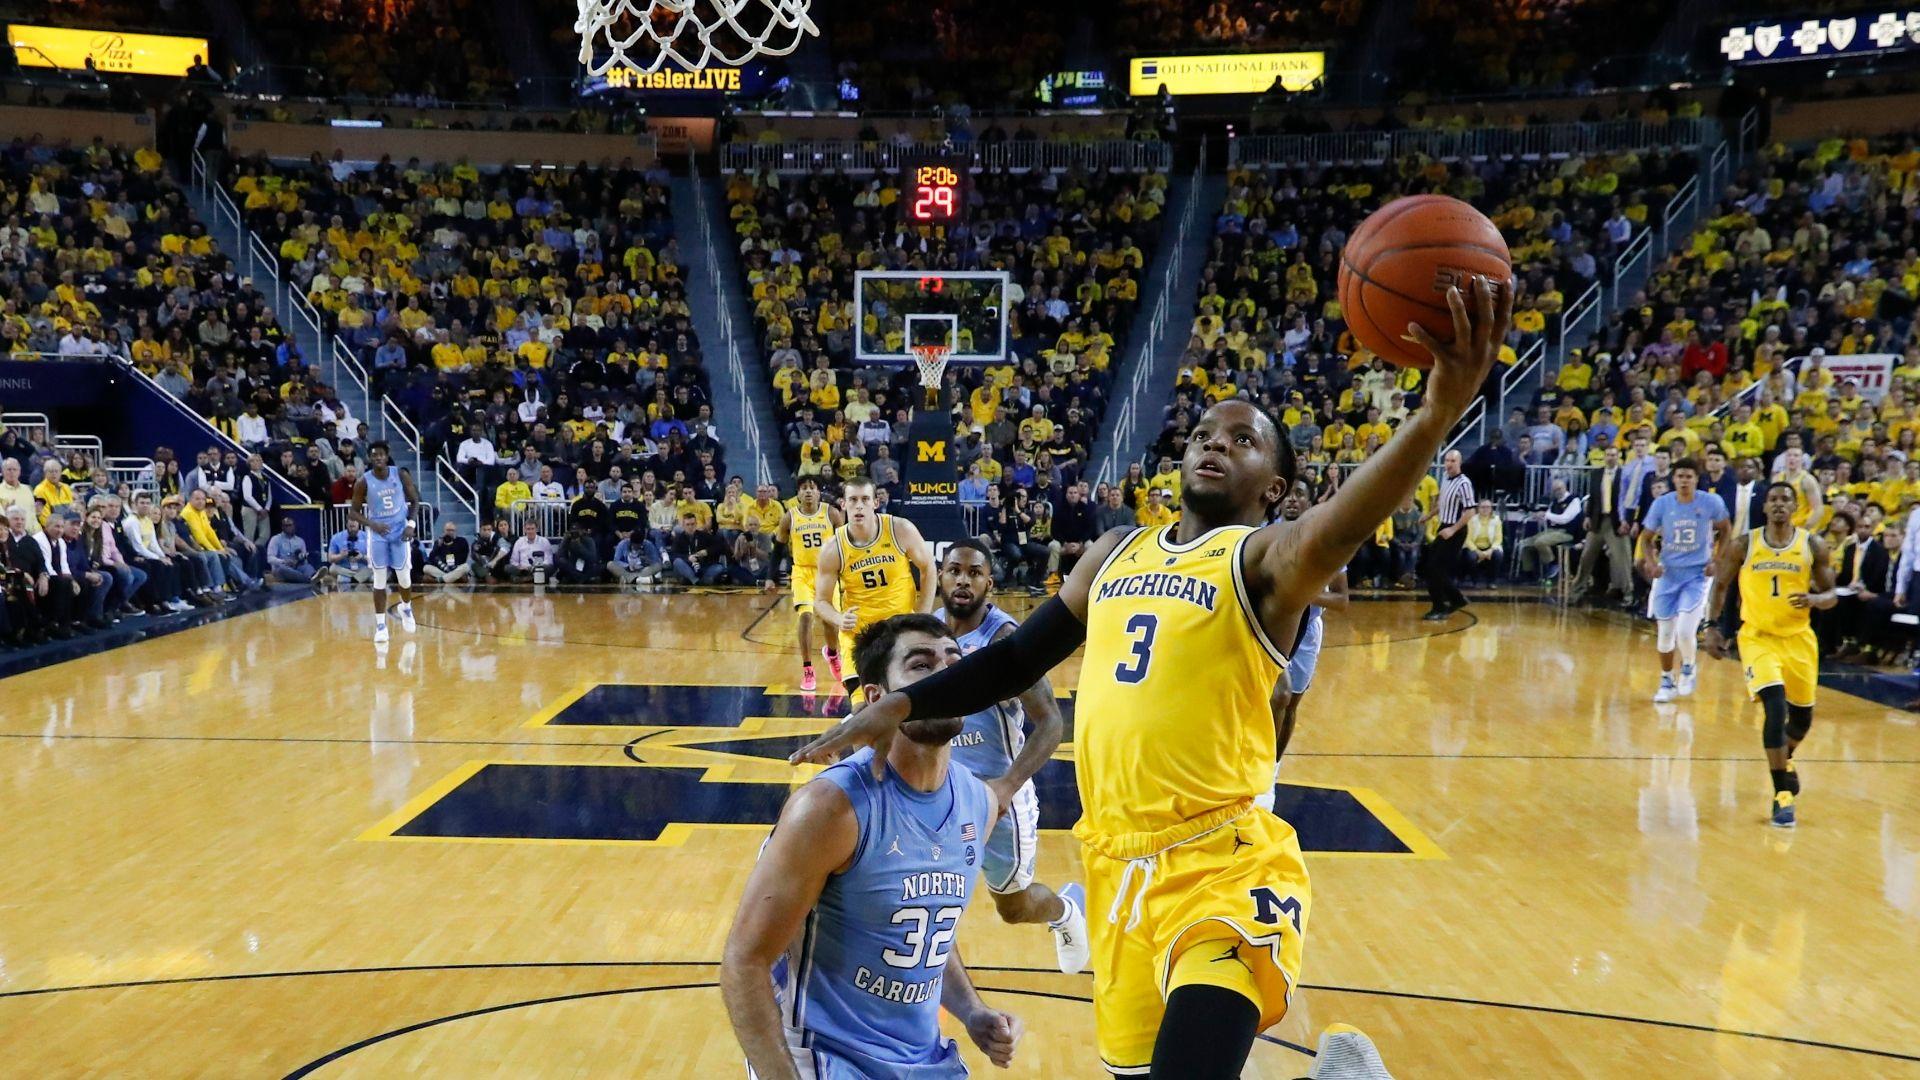 Michigan trounces UNC to stay unbeaten